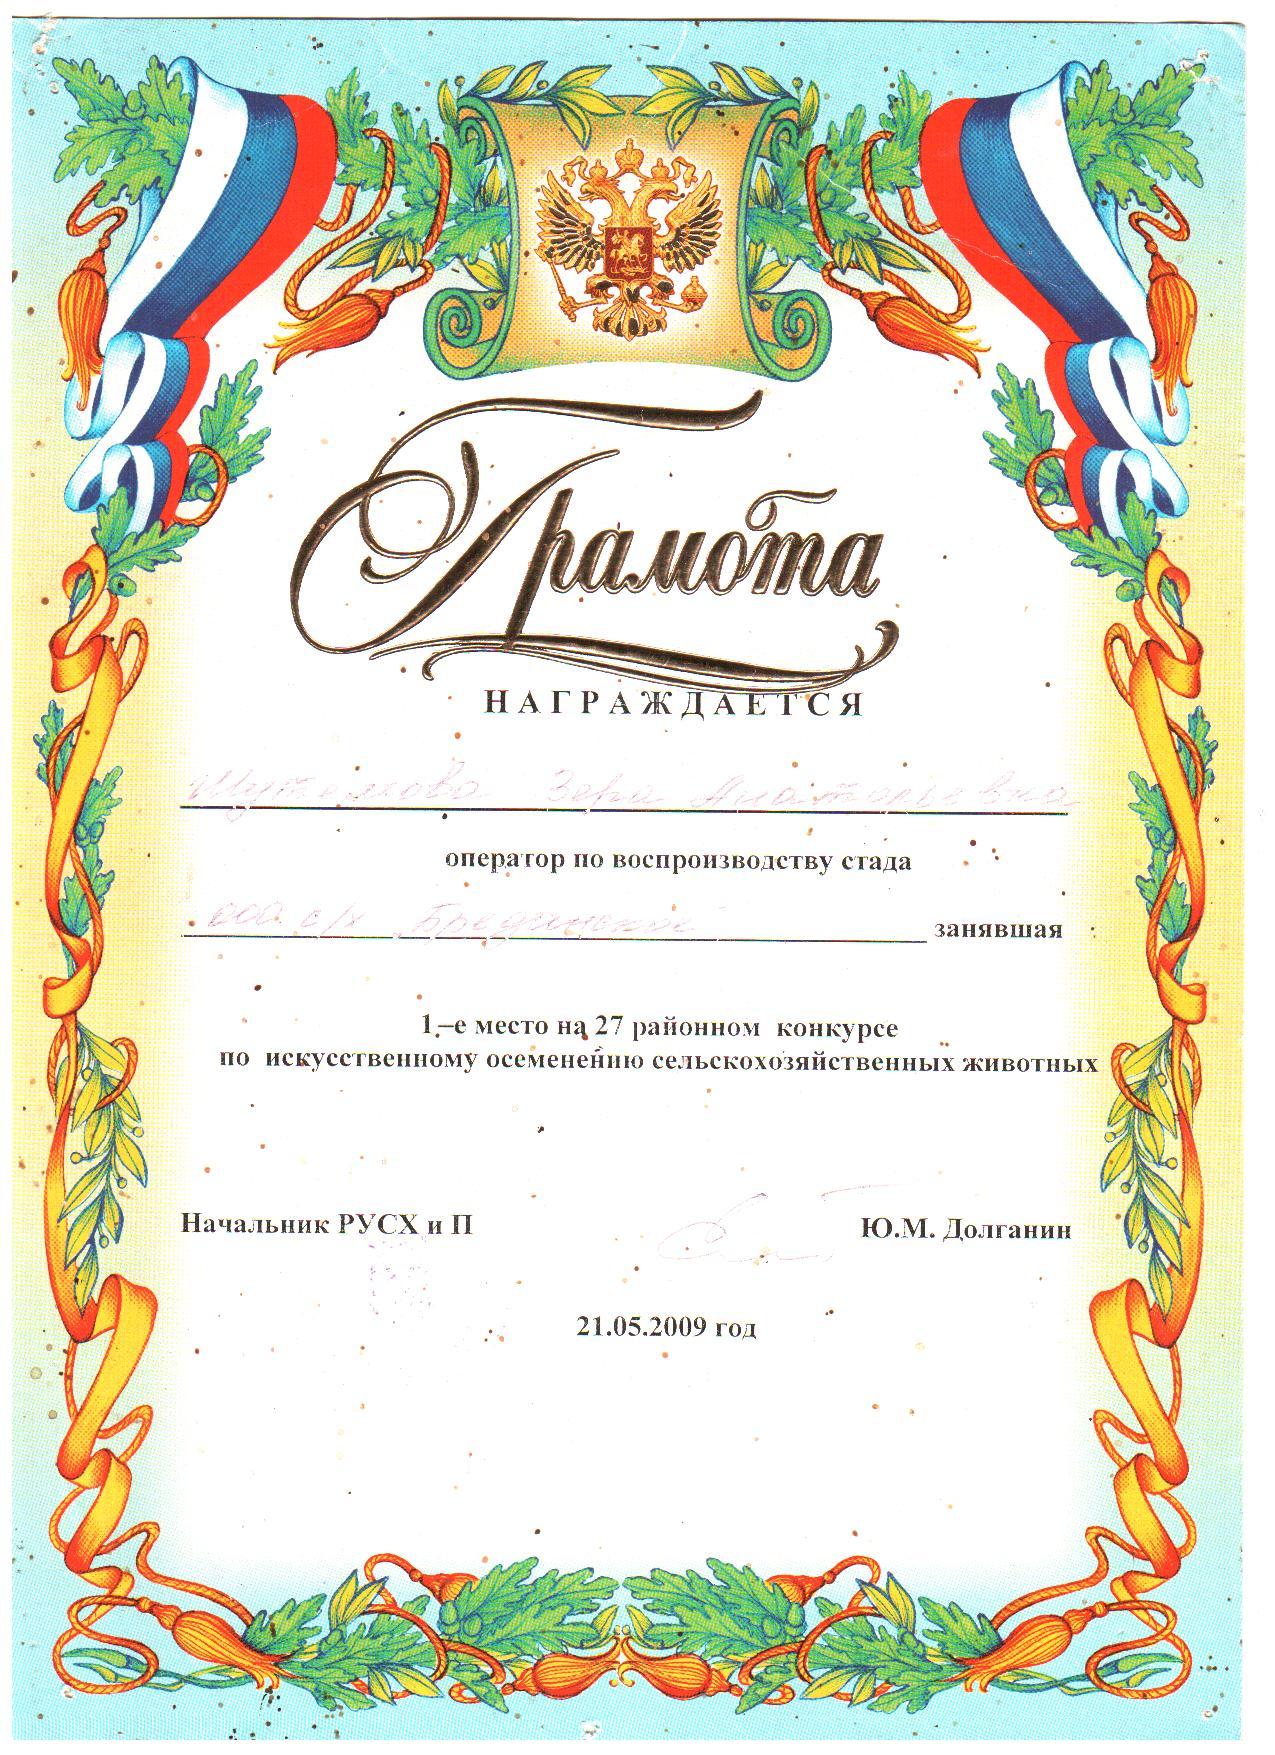 C:\Documents and Settings\Администратор\Рабочий стол\Шутёмова приложение\Изображение 017.jpg